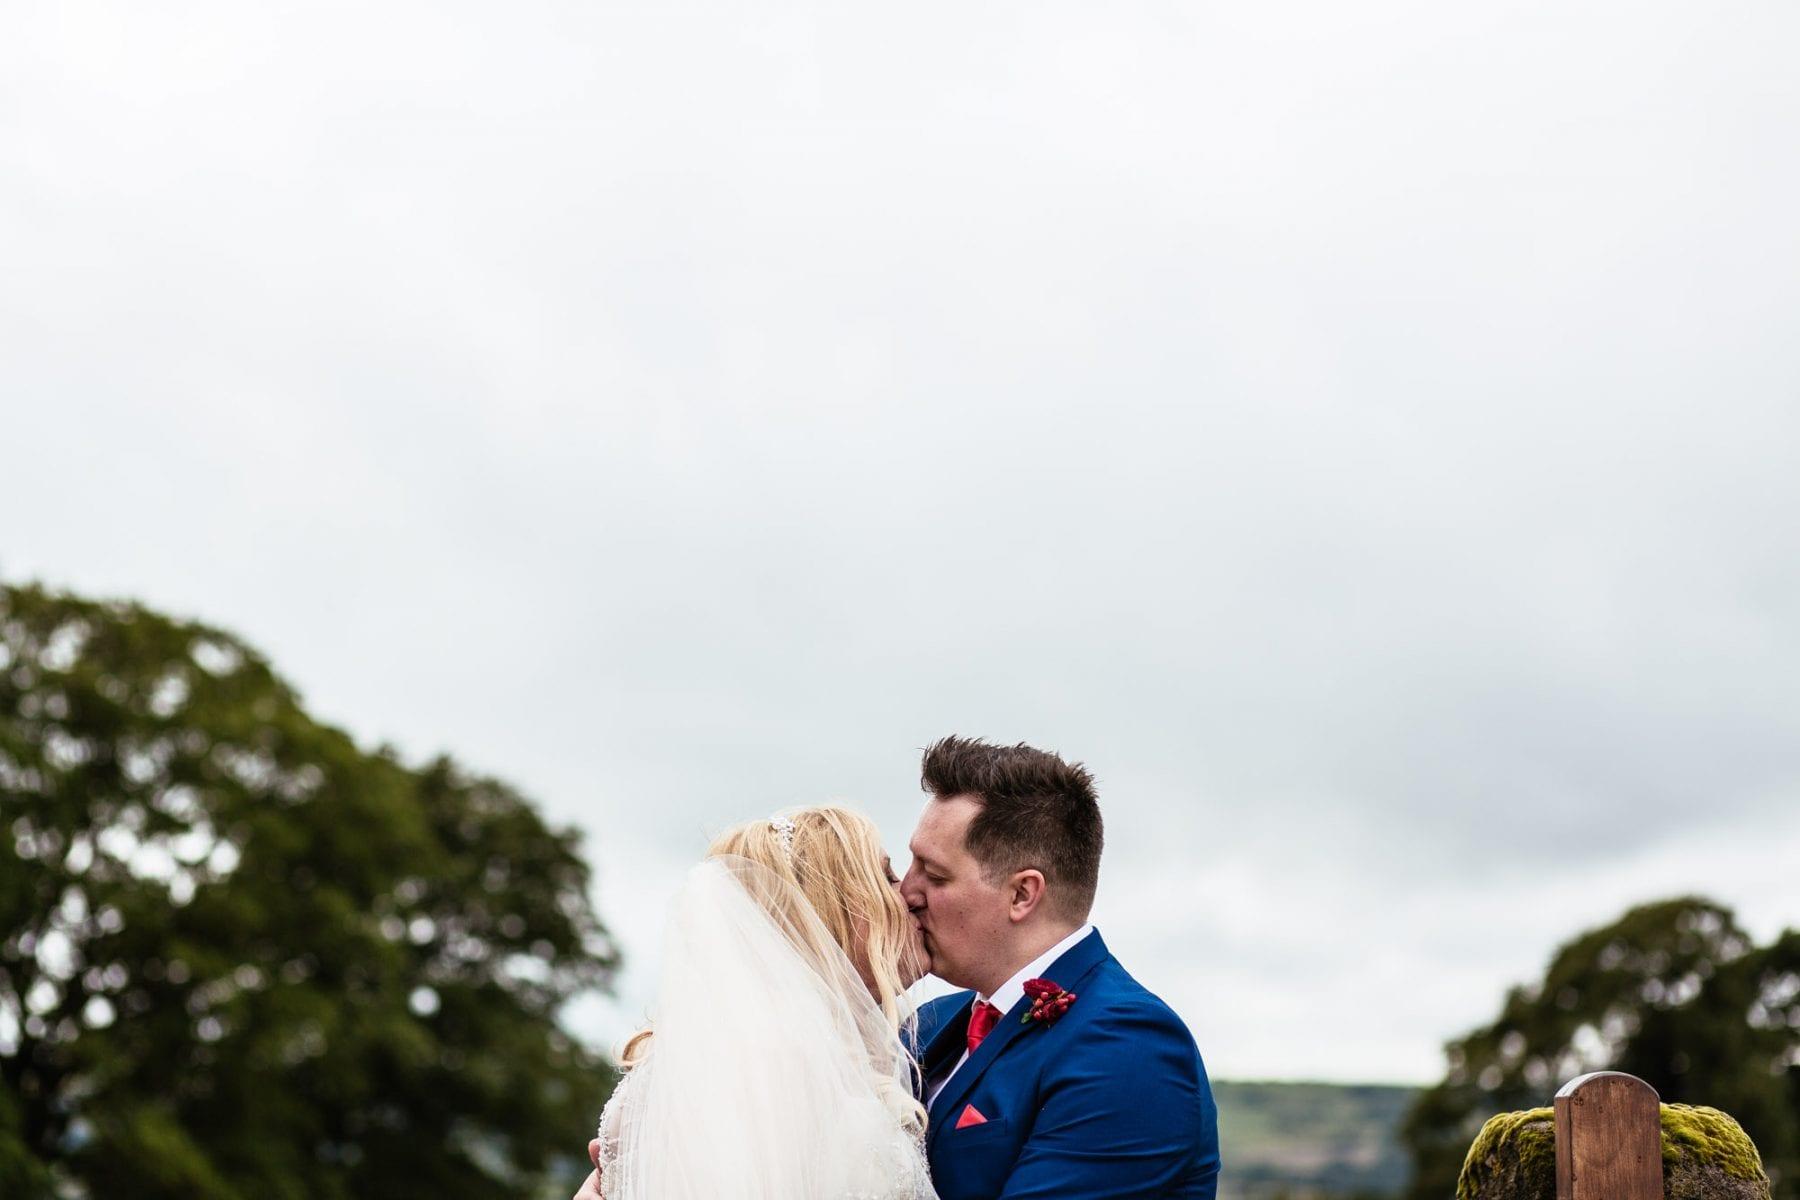 Creative Wedding Photography Heaton House Farm